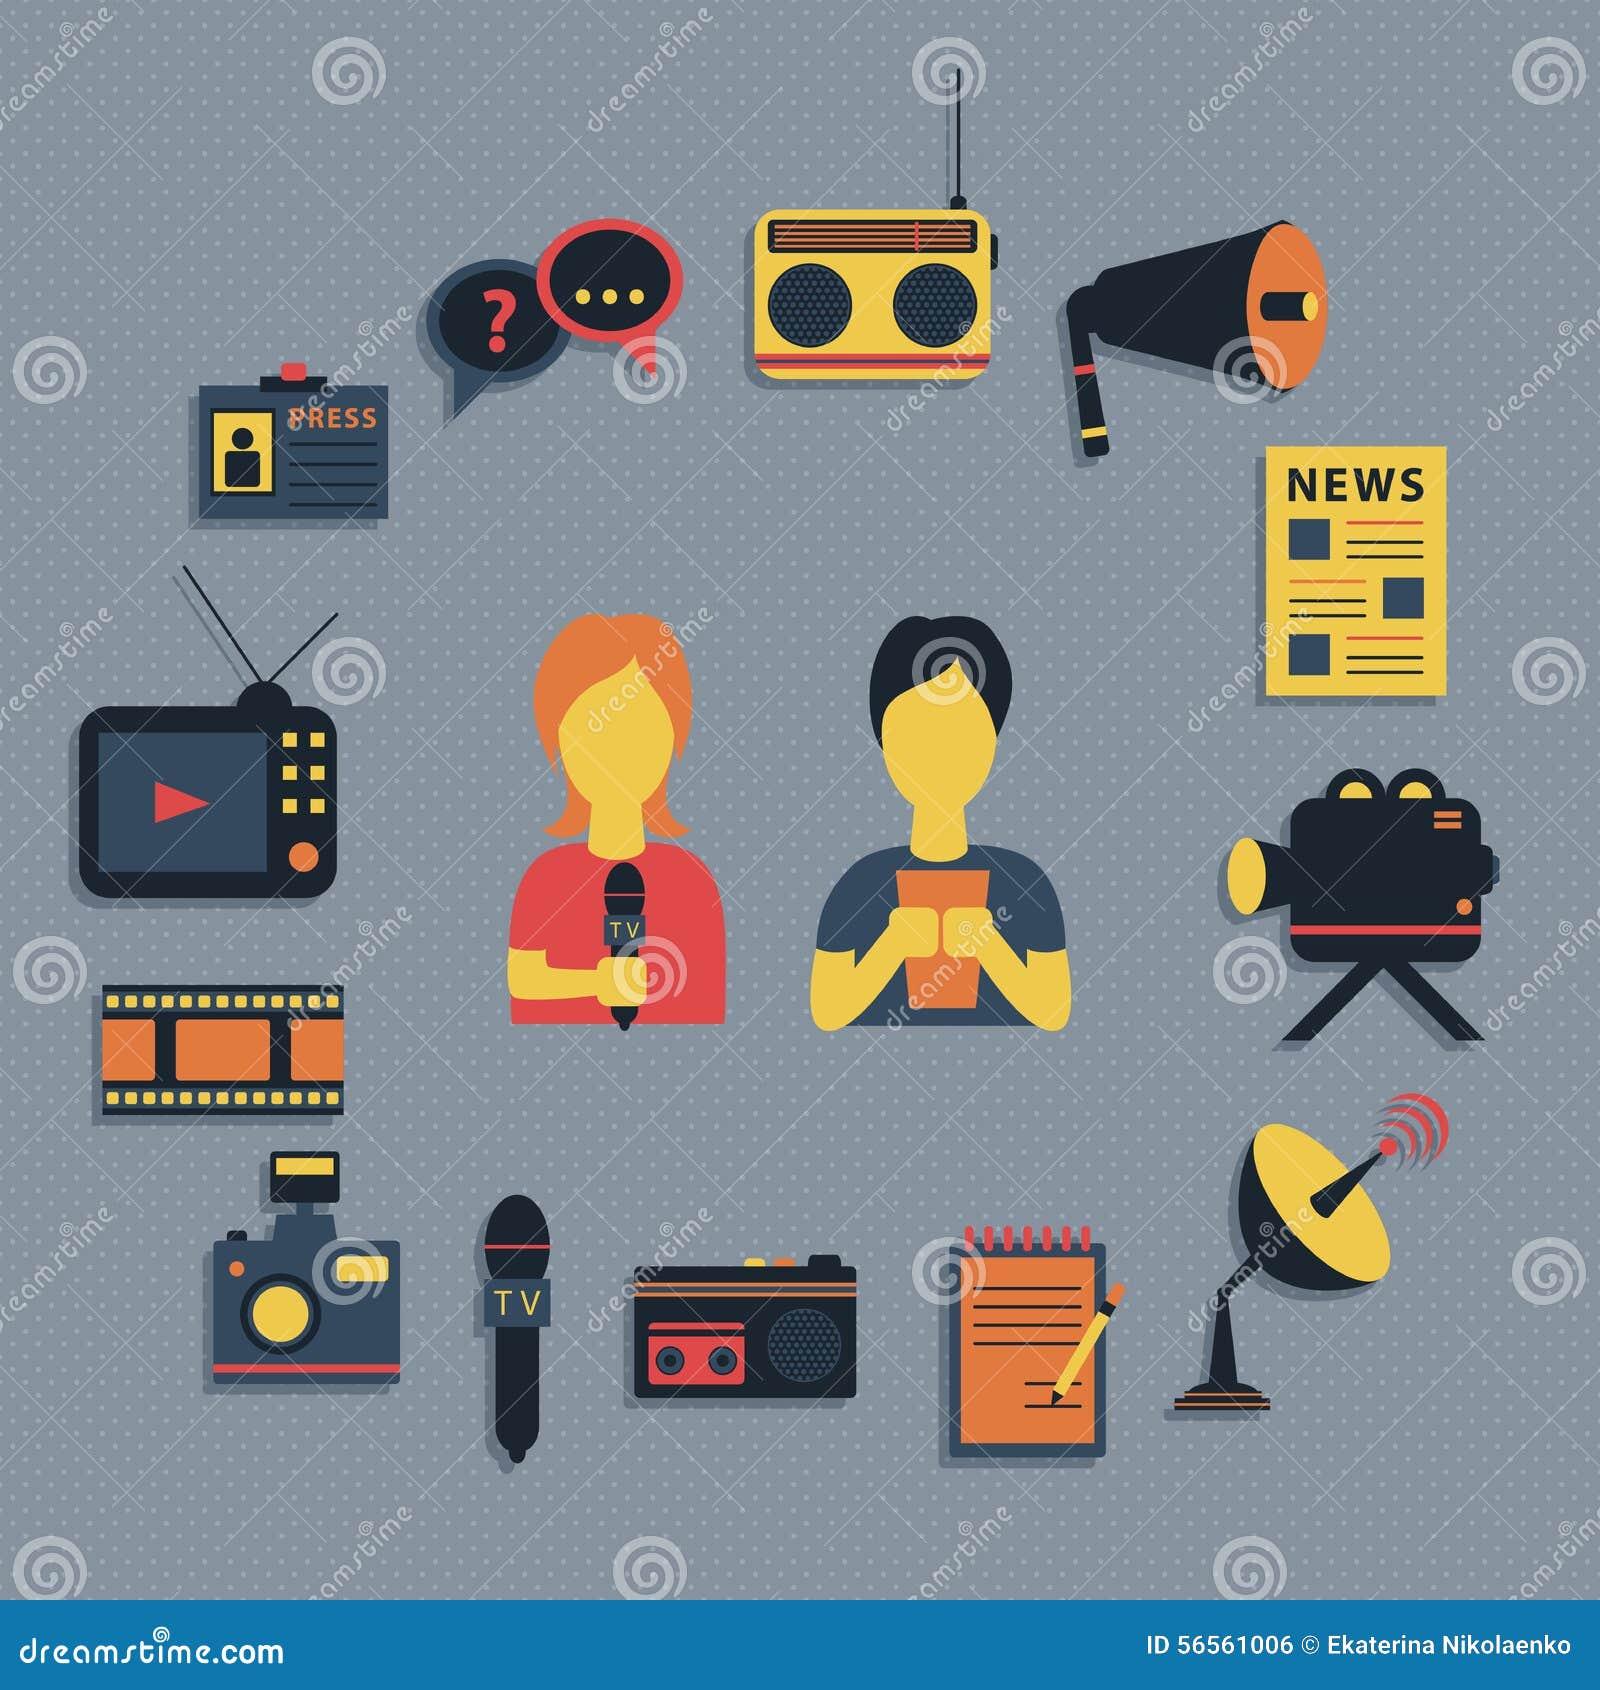 Download Η διανυσματική απεικόνιση των ειδήσεων ραδιοφωνικής αναμετάδοσης δημοσιογραφίας Μέσων Μαζικής Επικοινωνίας πέταξε τα επίπεδα επιχ Διανυσματική απεικόνιση - εικονογραφία από δημιουργικός, ειδήσεις: 56561006